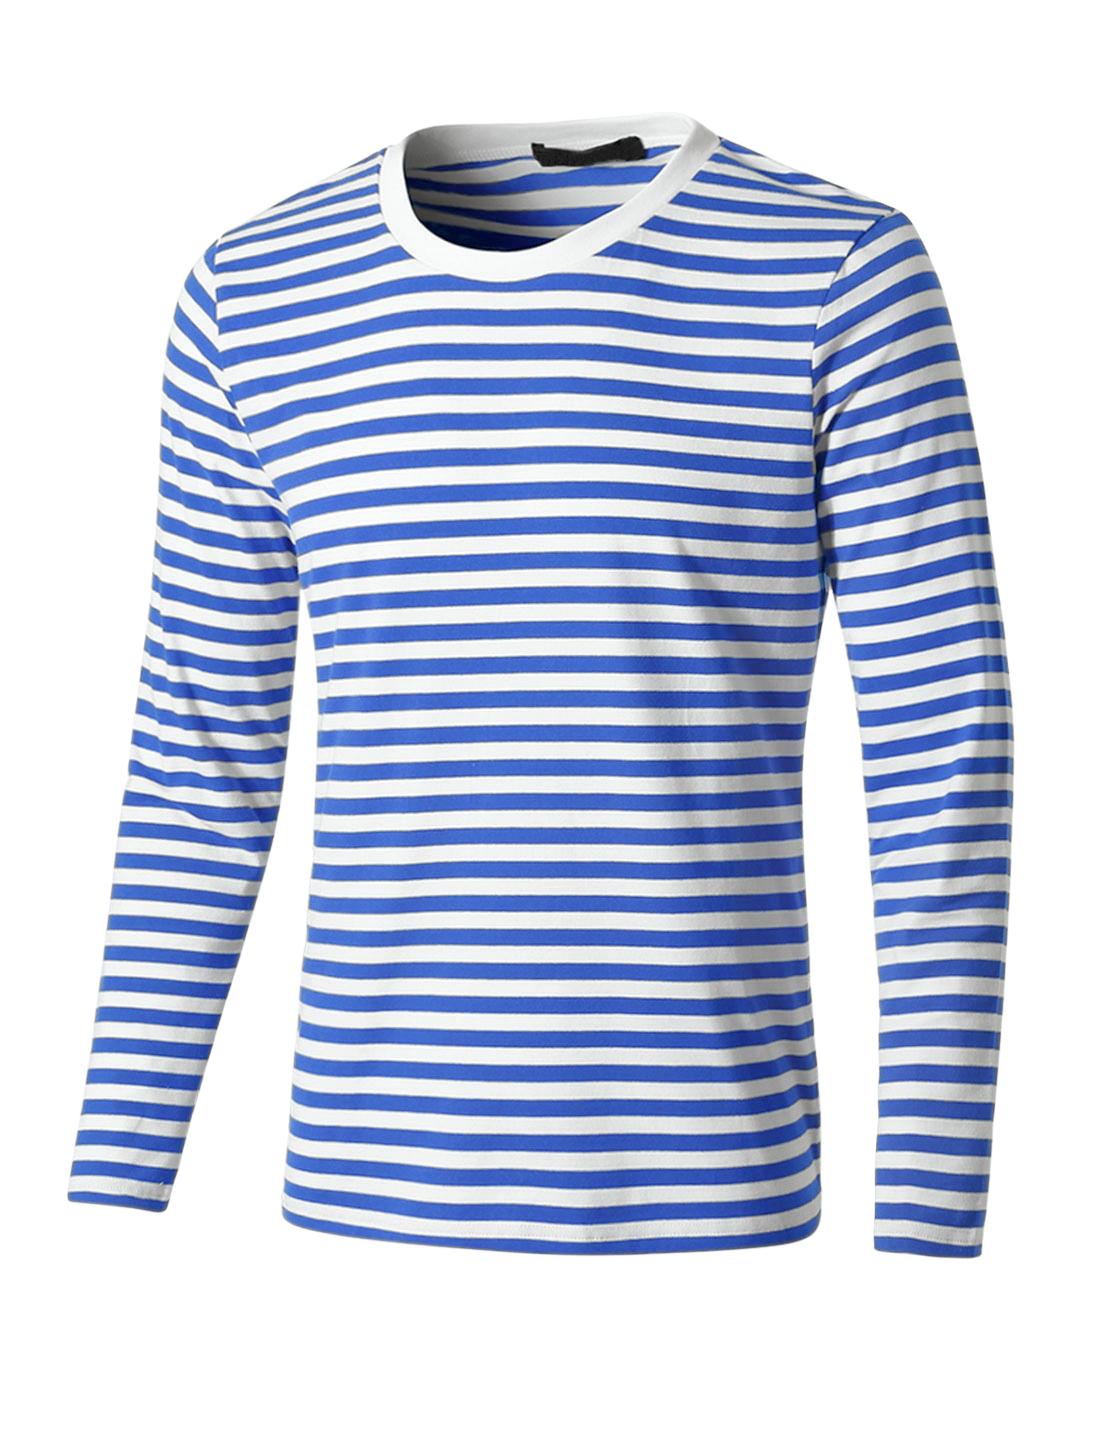 Men Crew Neck Long Sleeve Striped Tee T Shirt Blue M M (US 38)